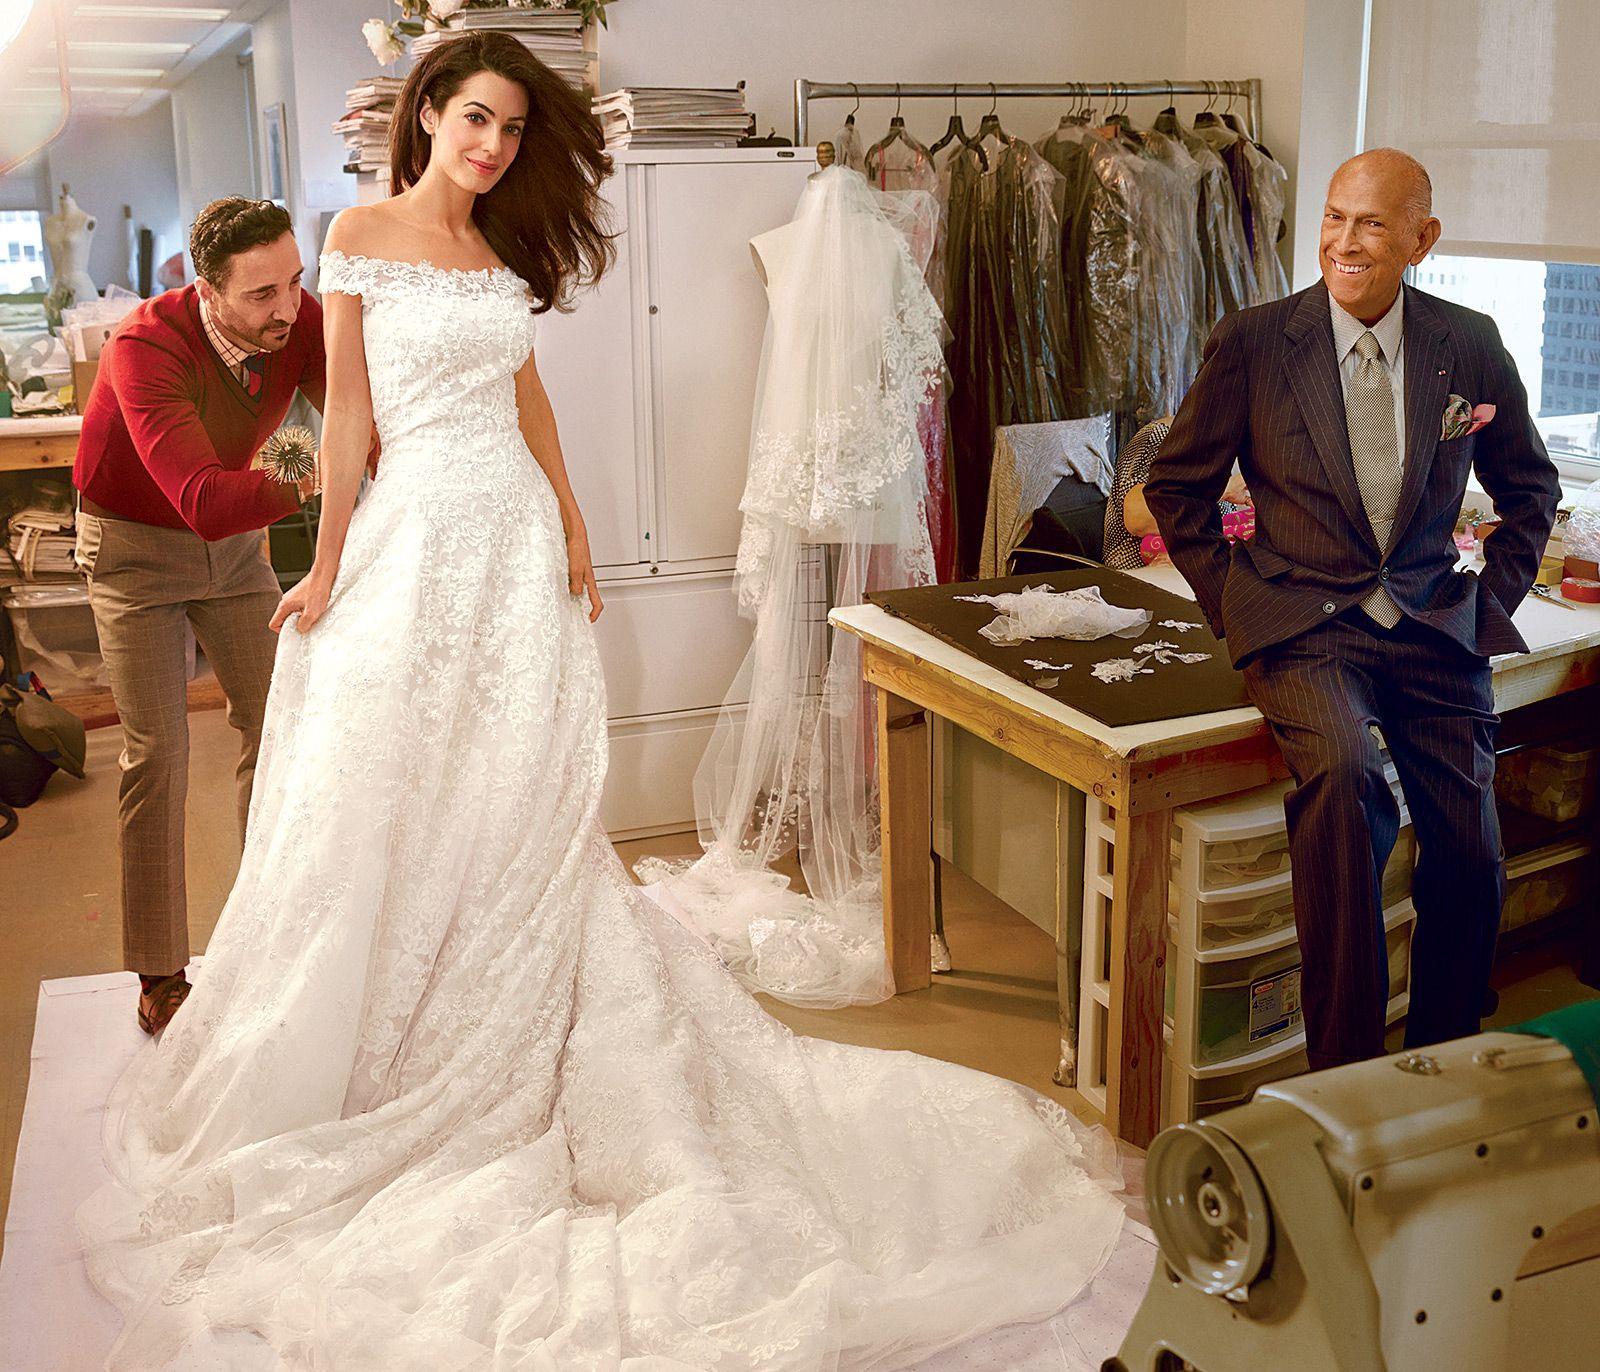 Amal Alamuddin Dress Fitting Clooneys Bride Talks Romantic